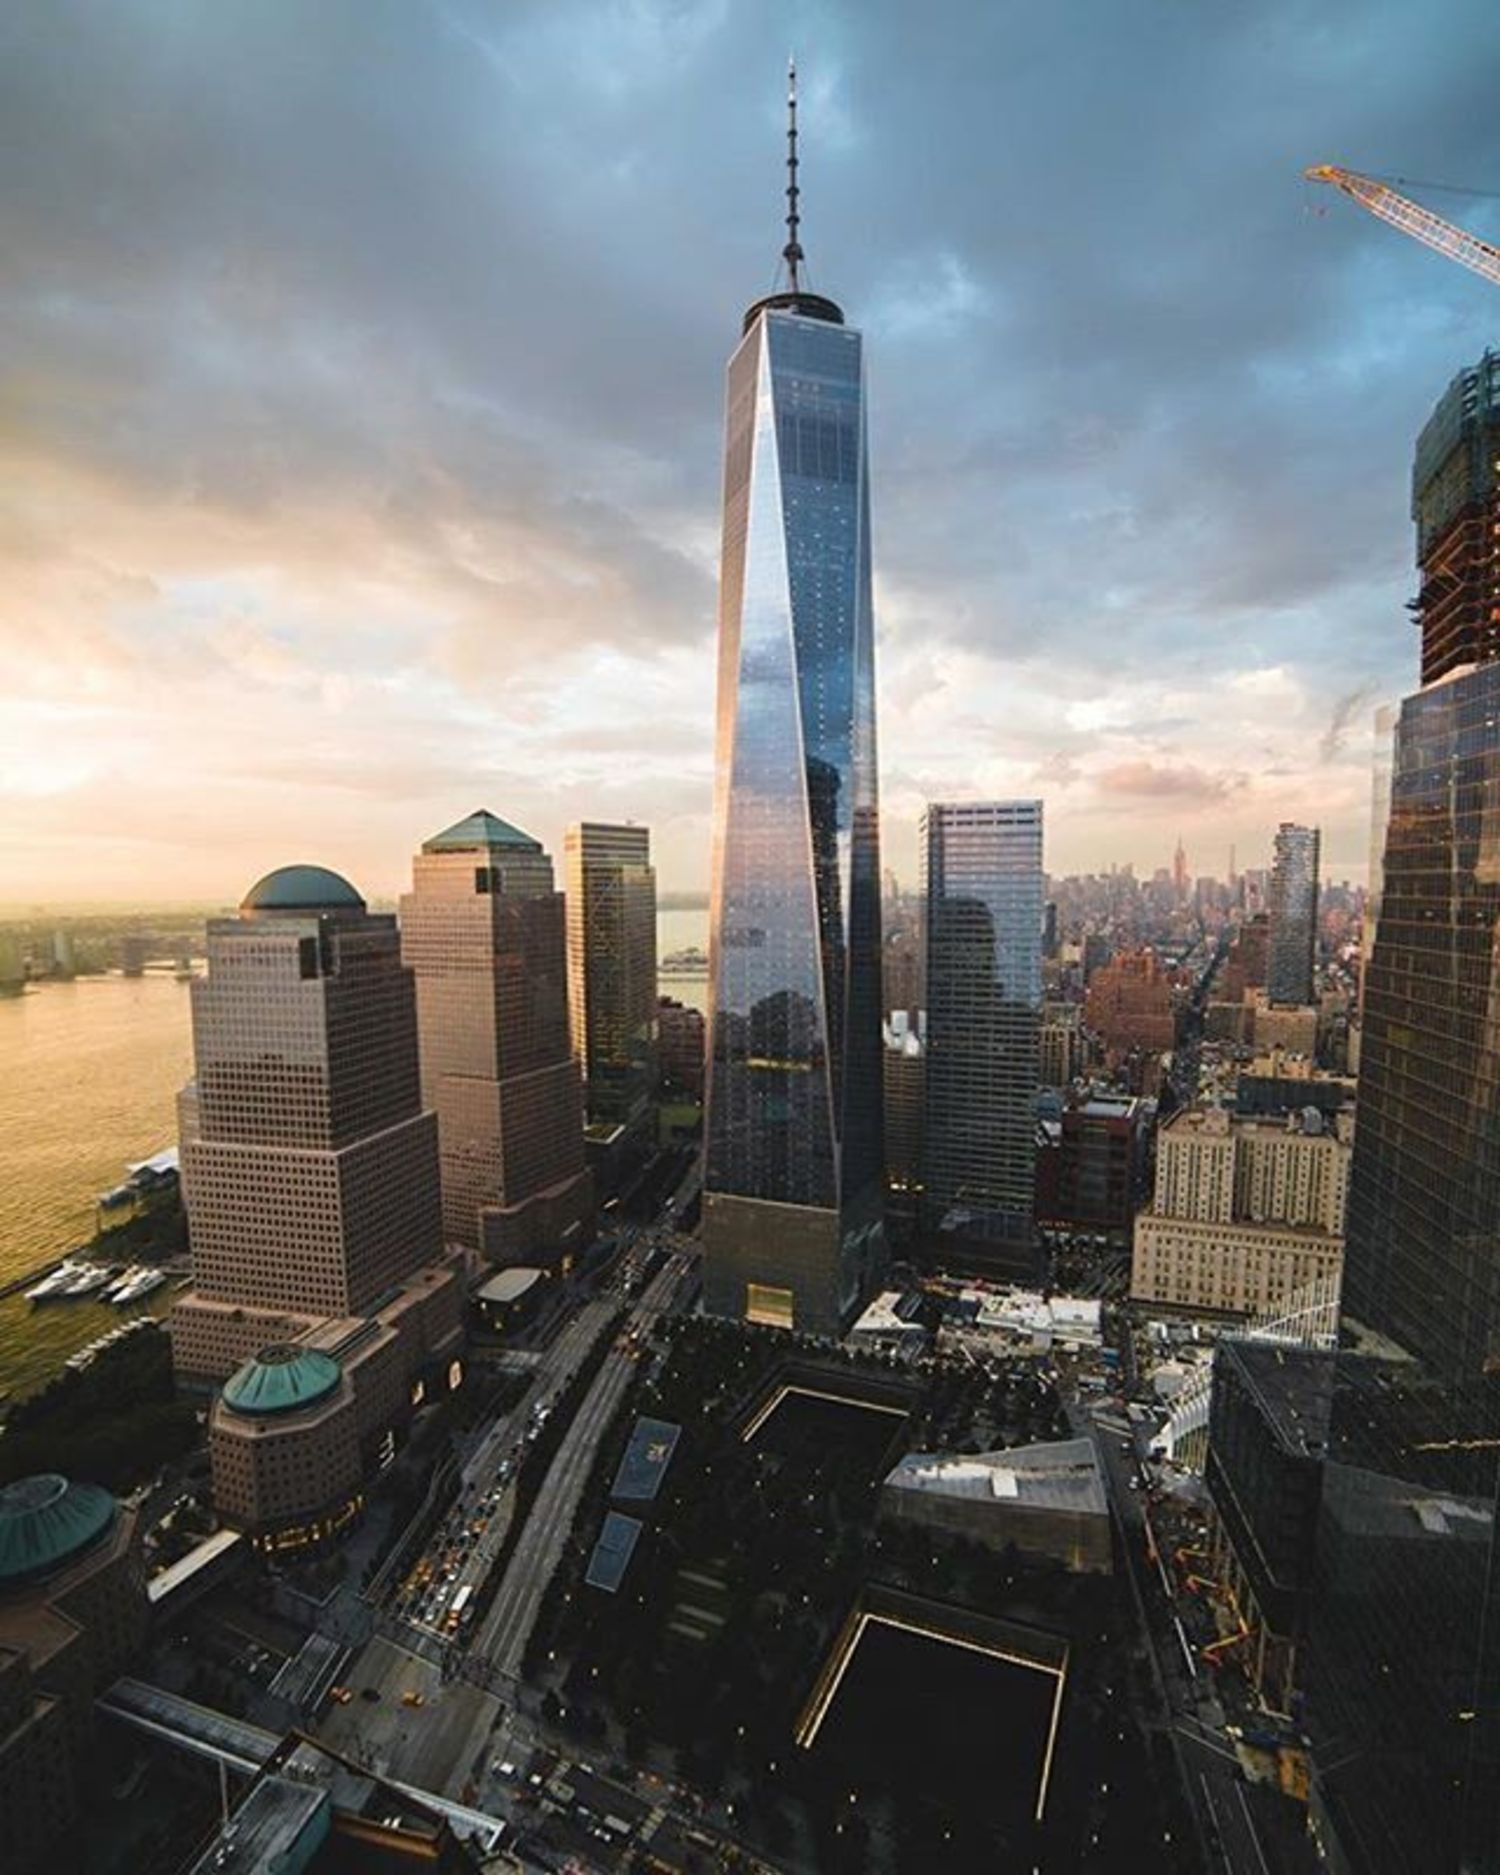 New York, New York. Photo via @flashing.lights #viewingnyc #newyorkcity #newyork #nyc